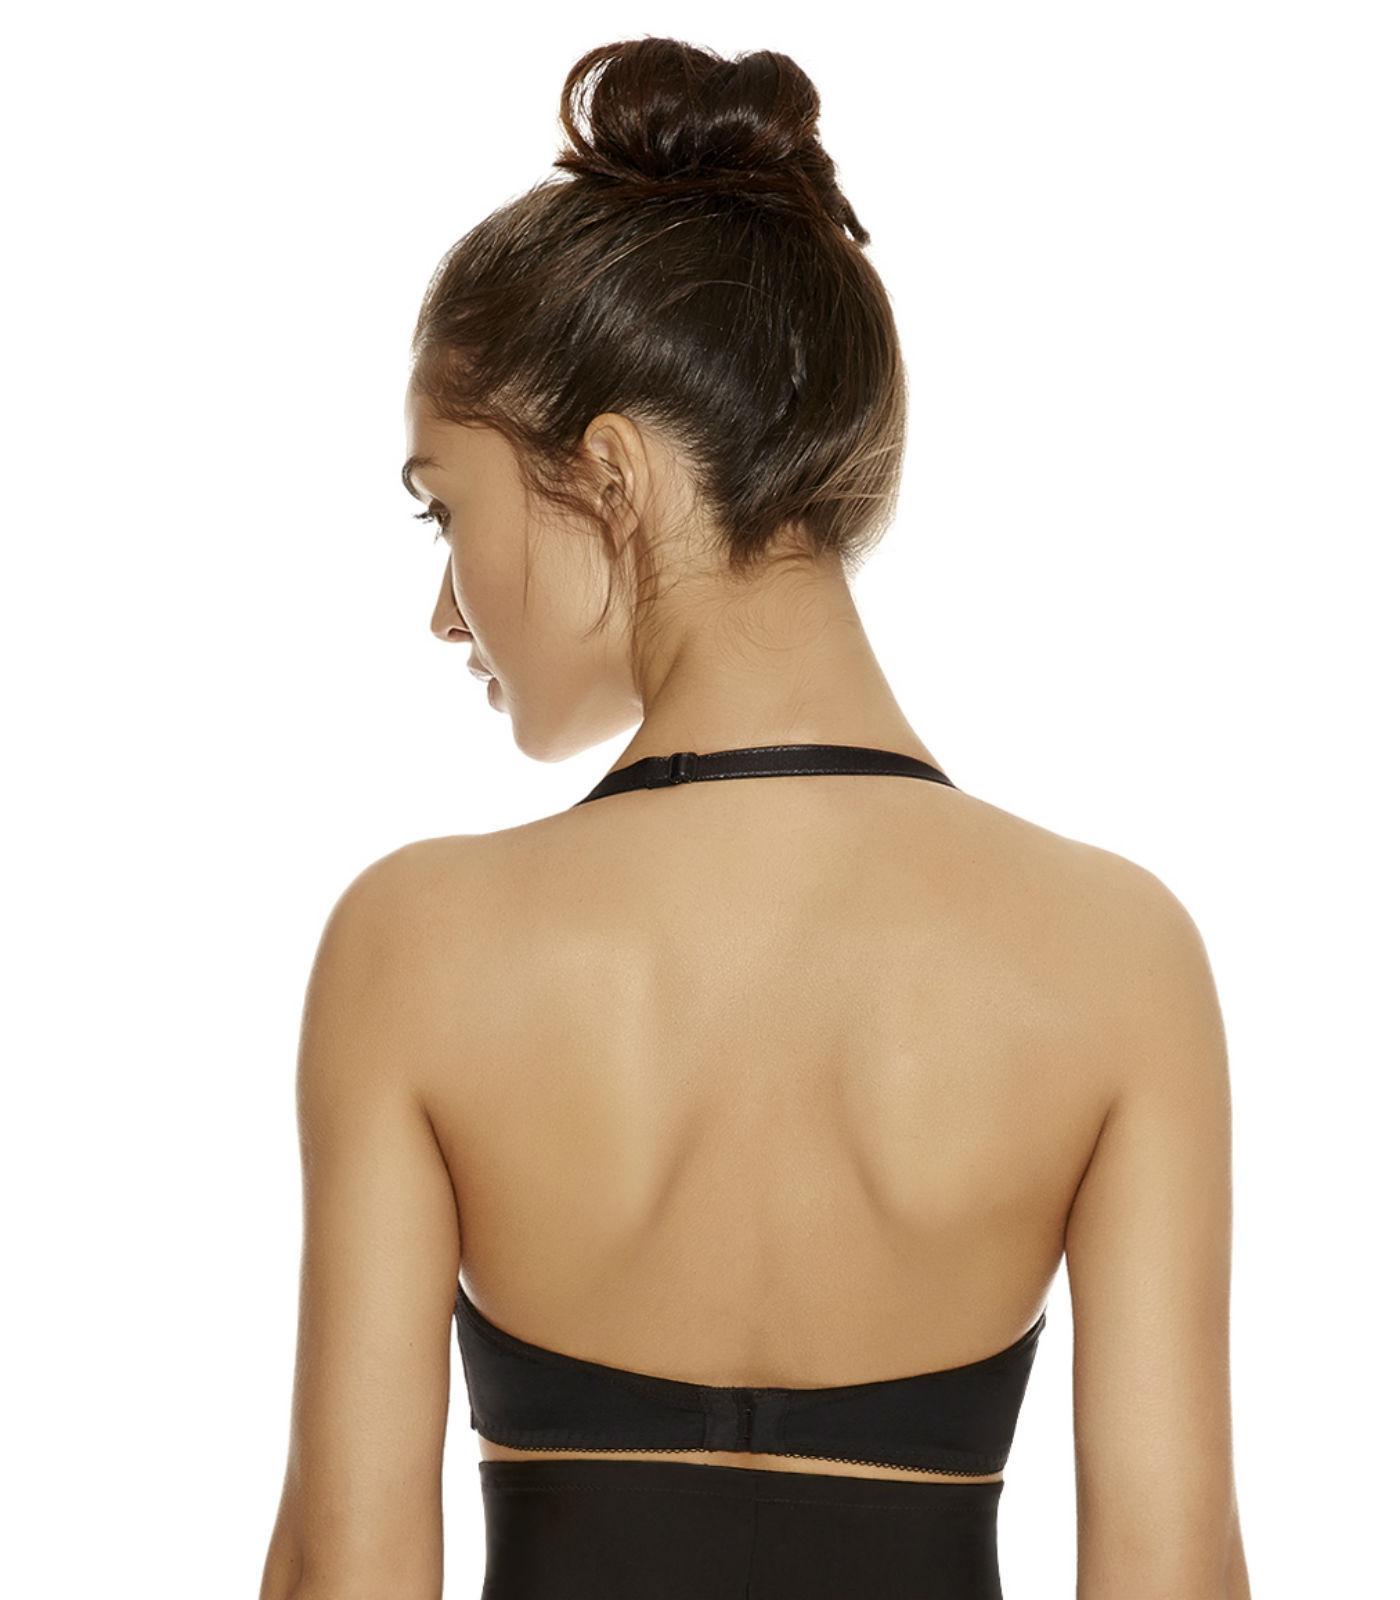 Freya-1464-Deco-Shape-Underwired-Plunge-Moulded-Multiway-Plunge-Bra-Shapewear